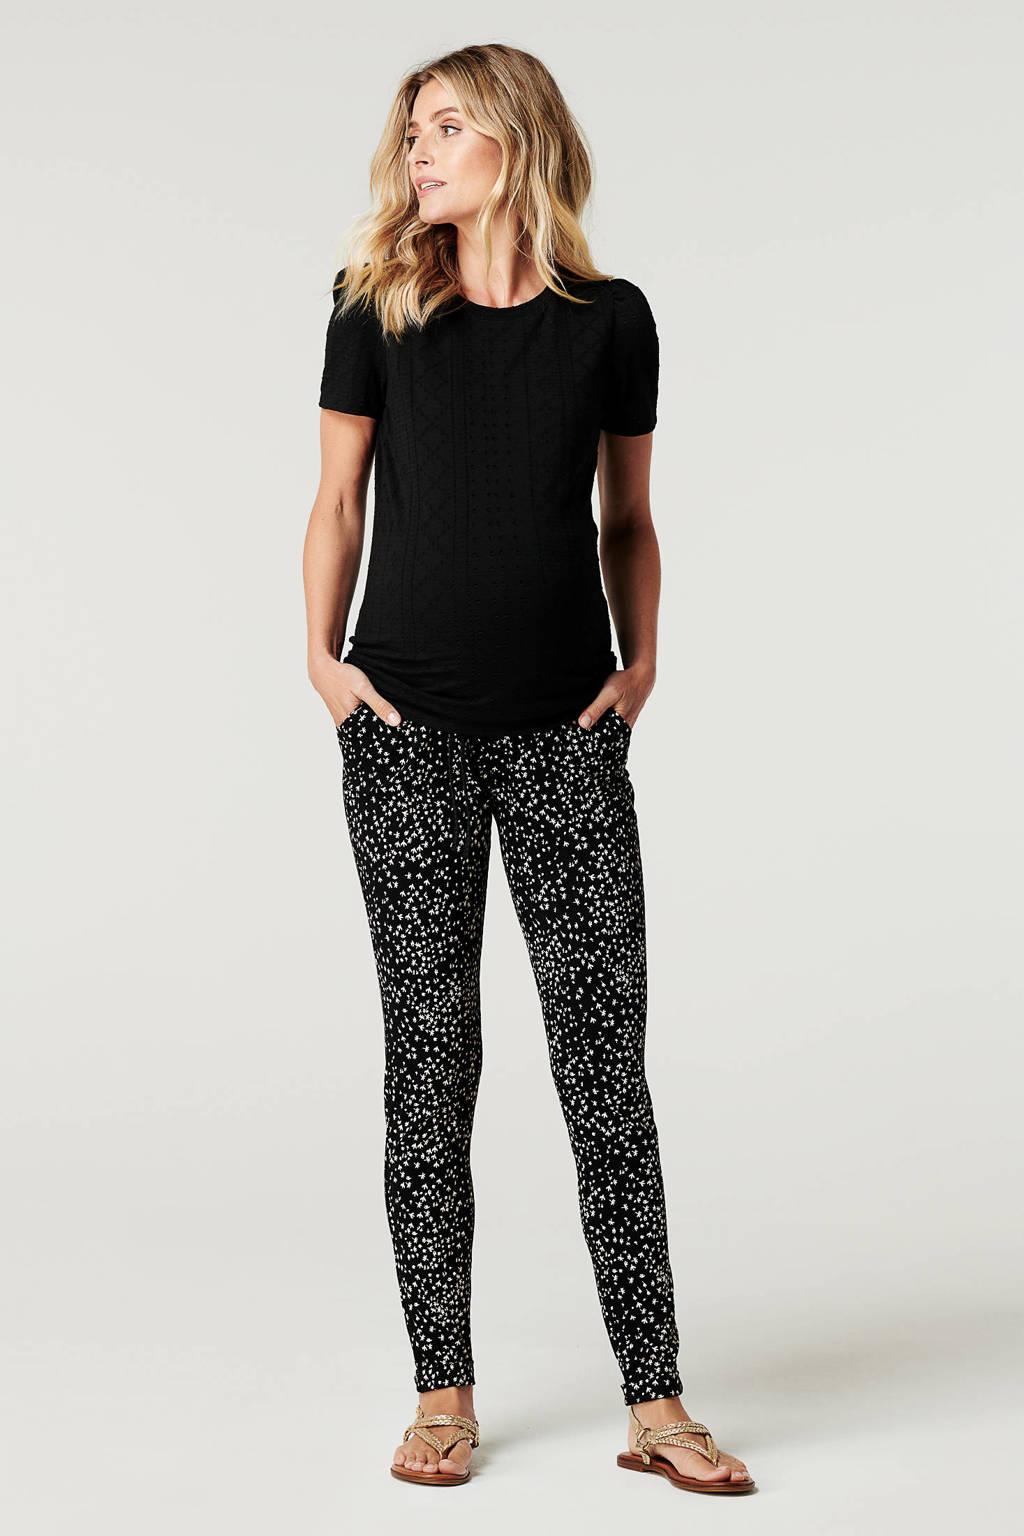 Noppies low waist regular fit zwangerschapsjoggingbroek Everett met all over print zwart/wit, Zwart/wit